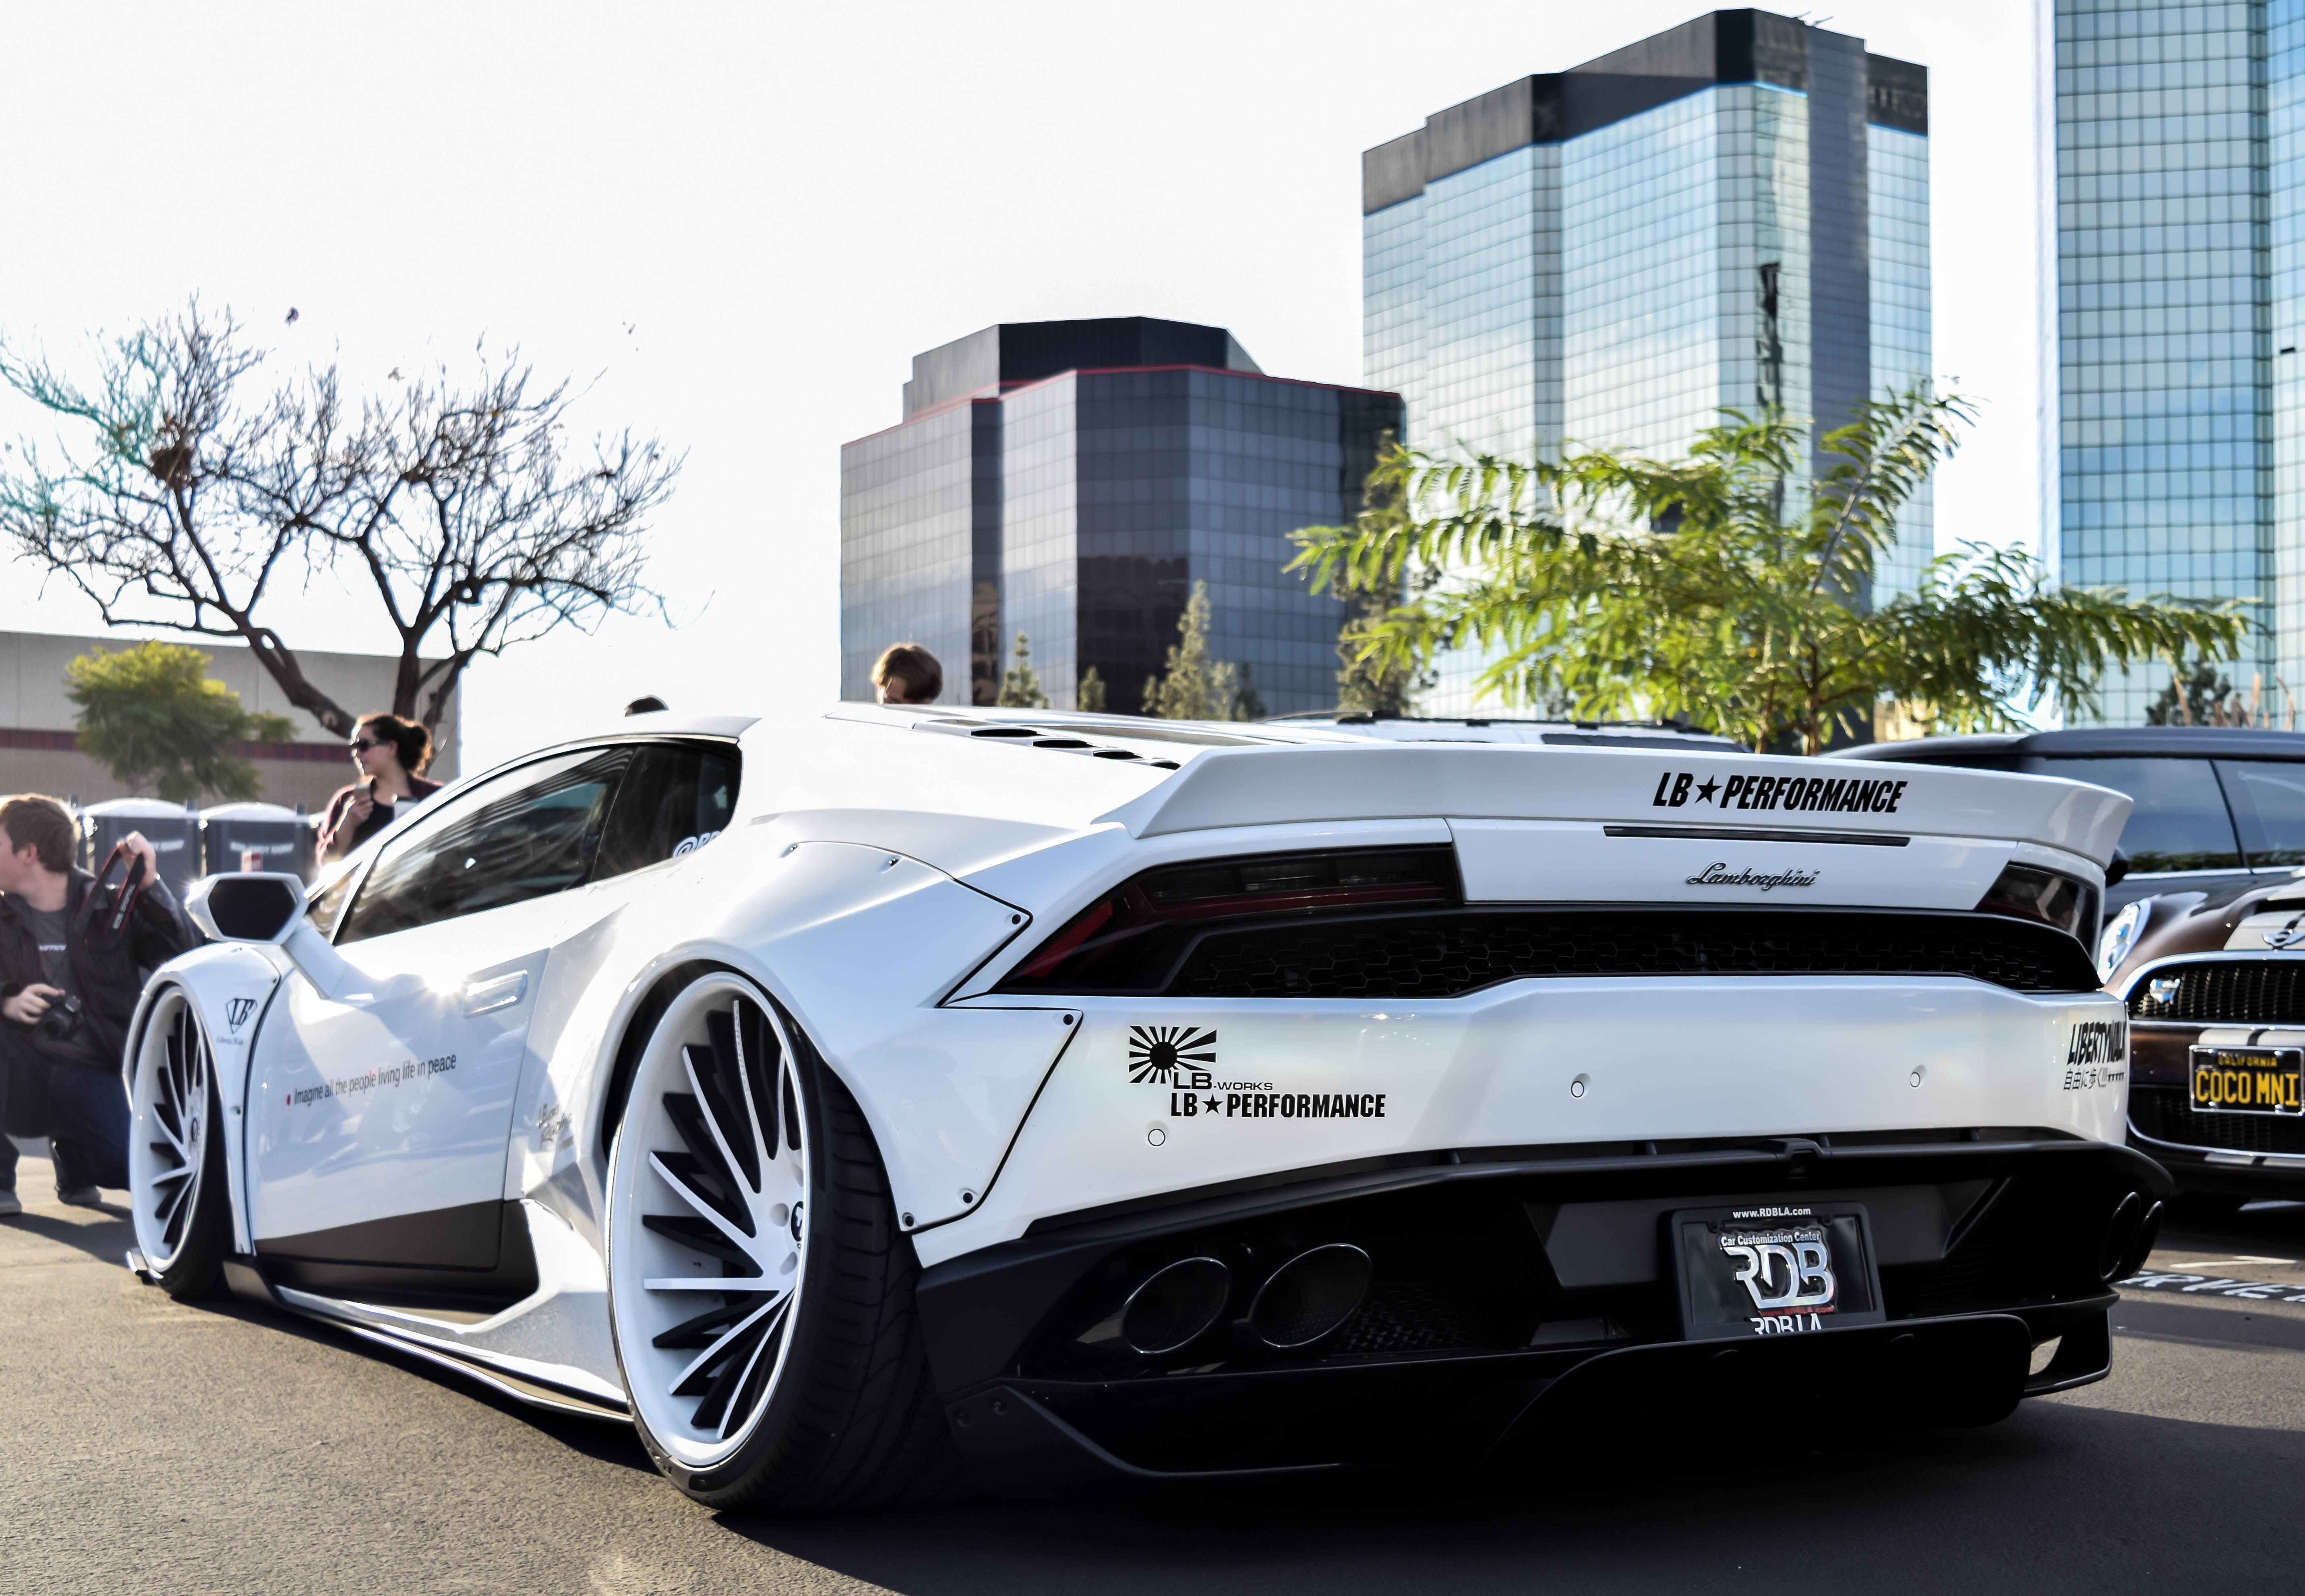 The Lamborghini Huracan Sports Cars Luxury Cool Sports Cars Super Cars